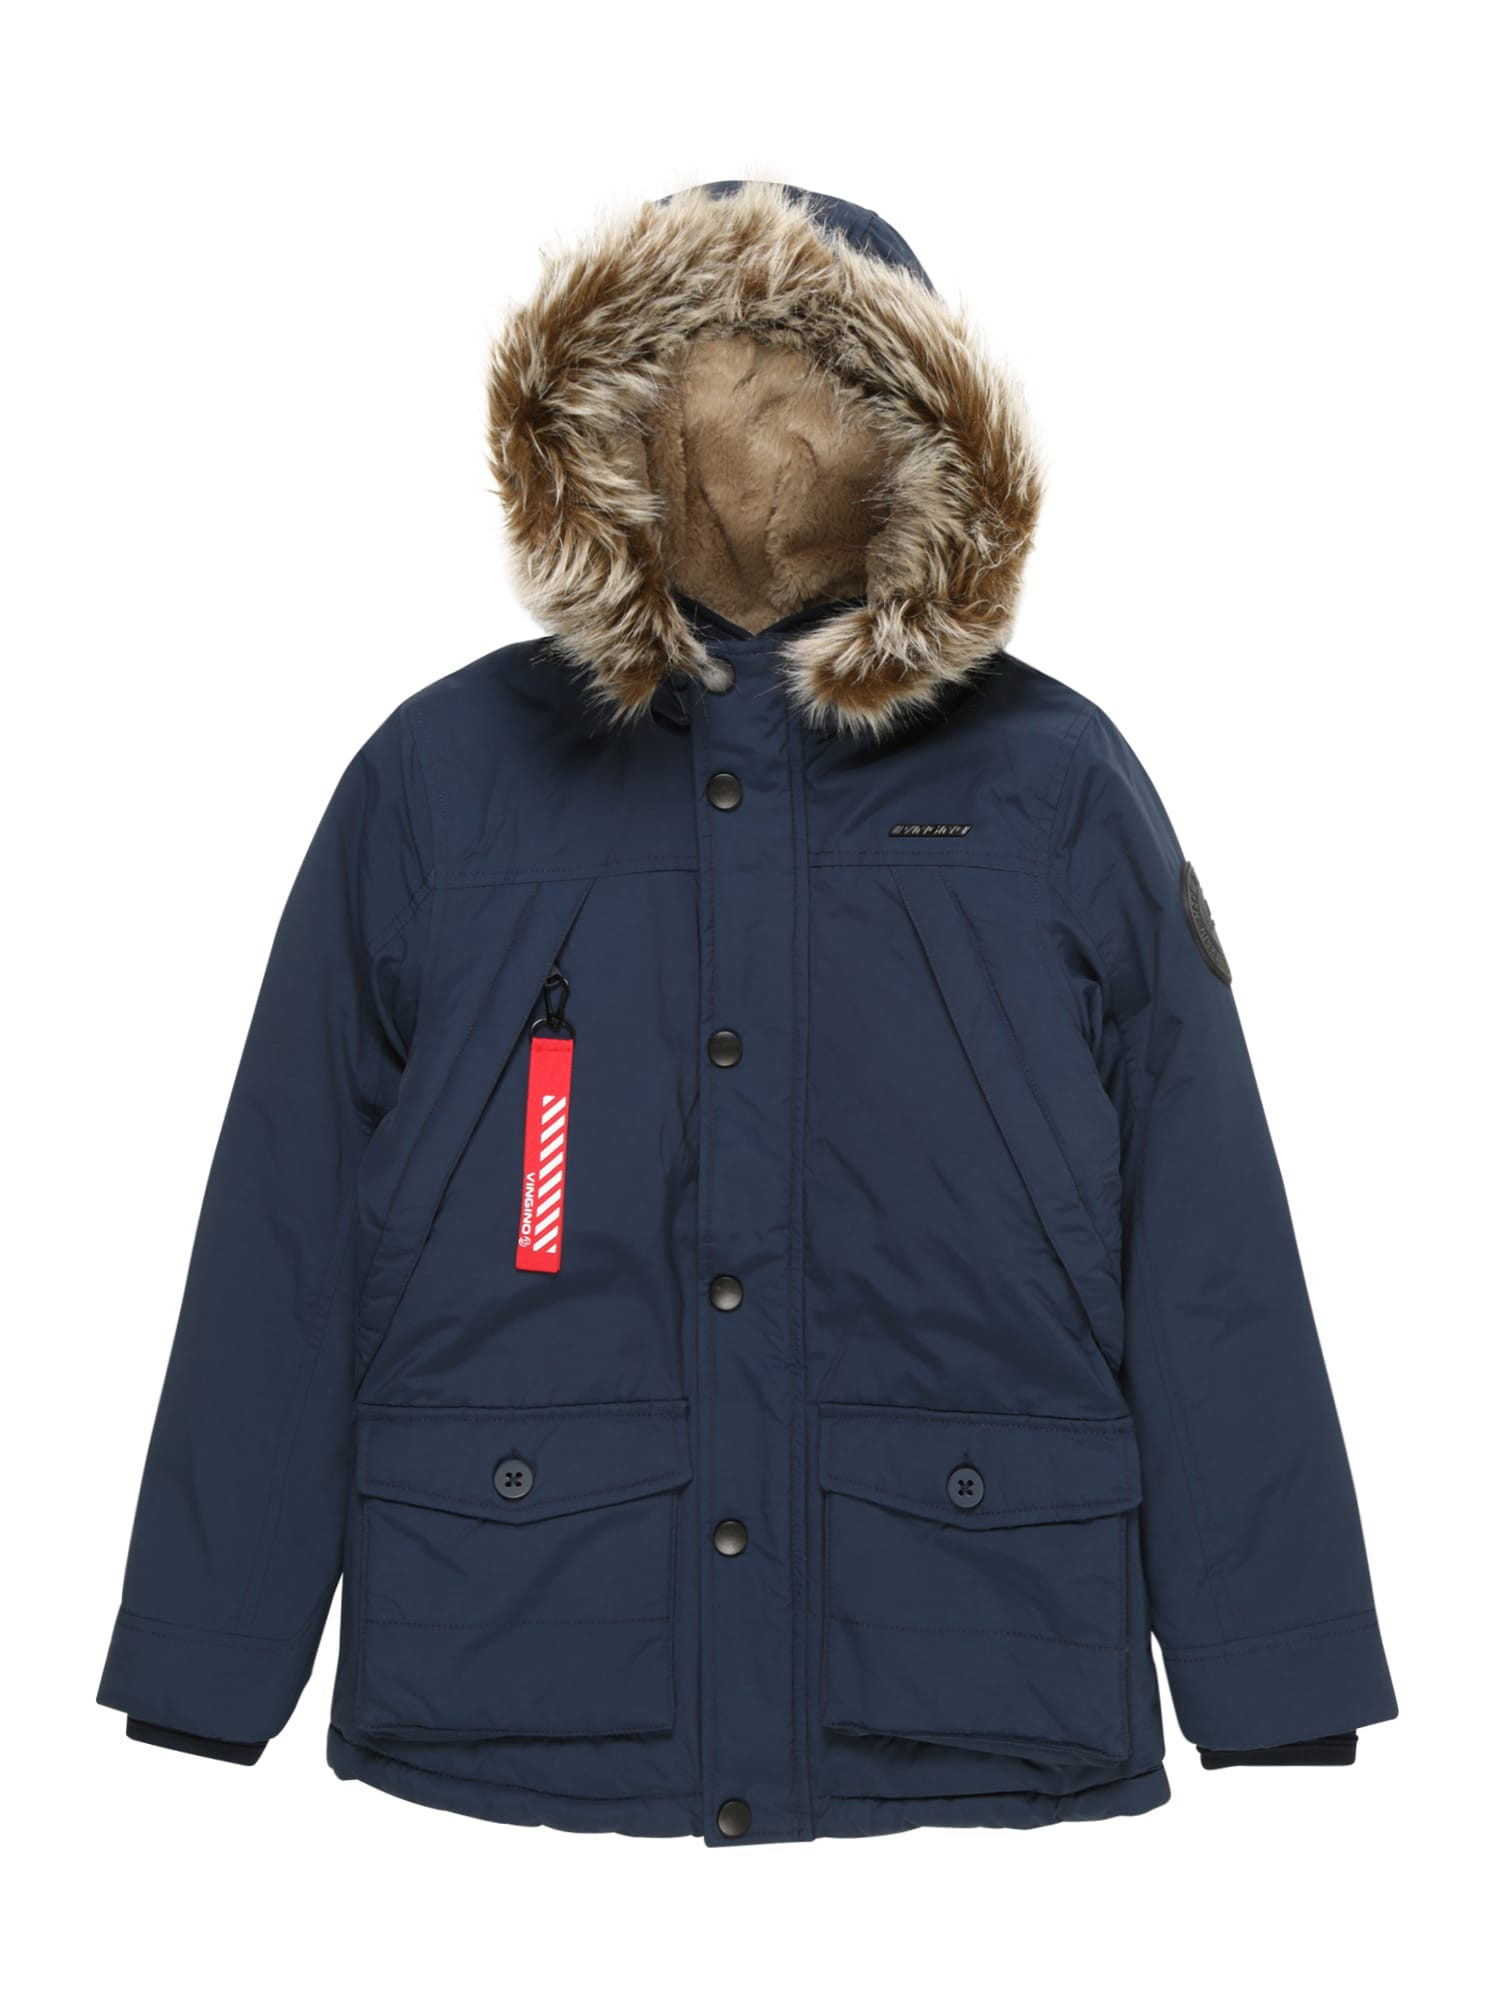 Přechodná bunda Thibaut tmavě modrá VINGINO